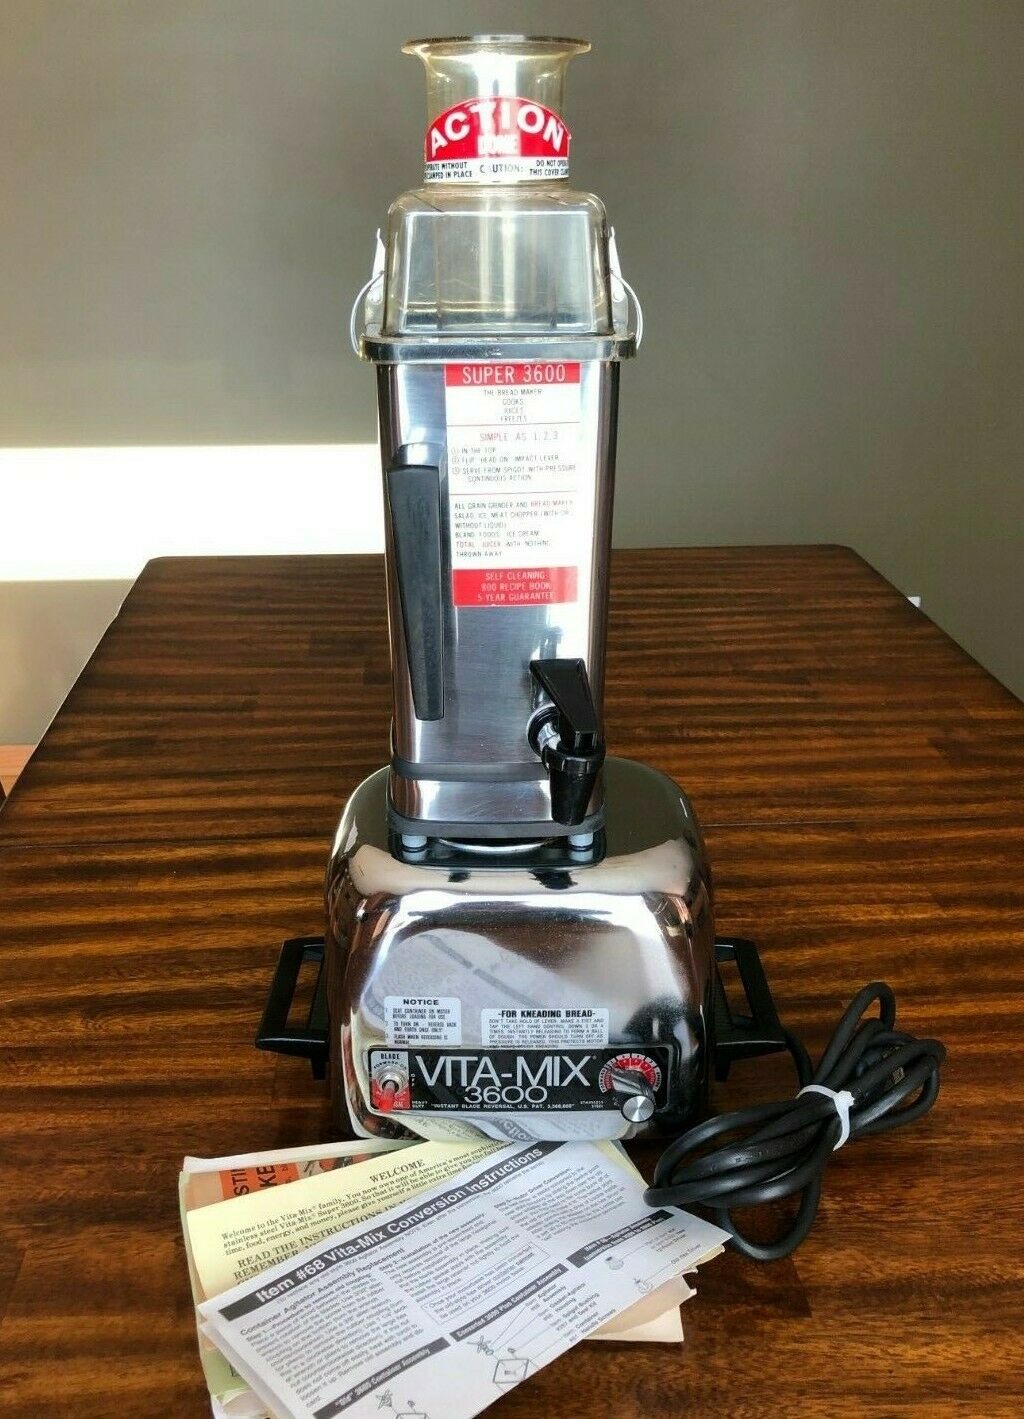 Vintage Vita-Mix Vitamix 3600 Blender inox centrifugeuse mixeur Food Processor